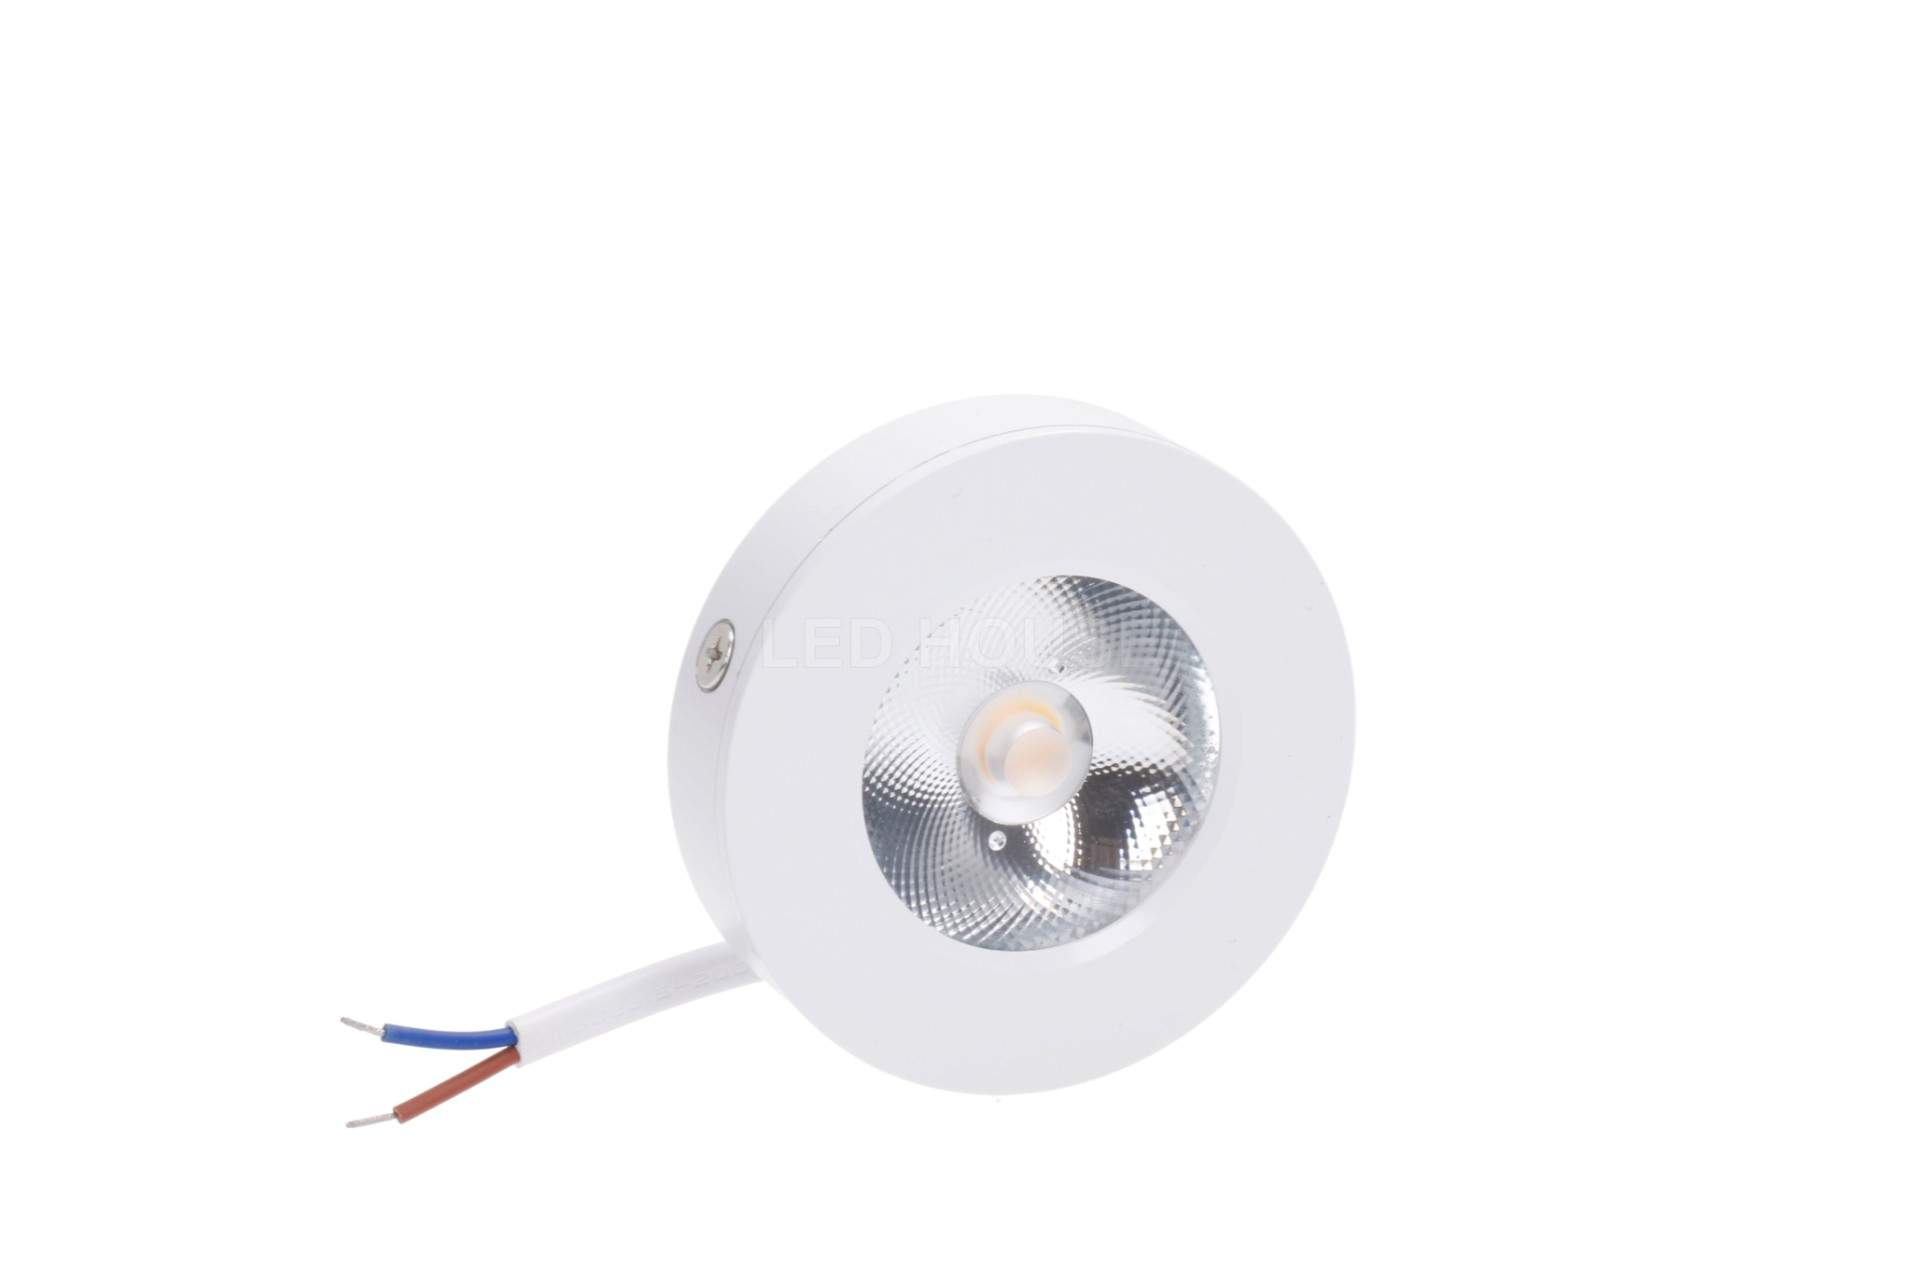 LED furniture light LED furniture light REVAL BULB FD DIM white round 7W 600lm CRI80  30° IP20 3000K warm white